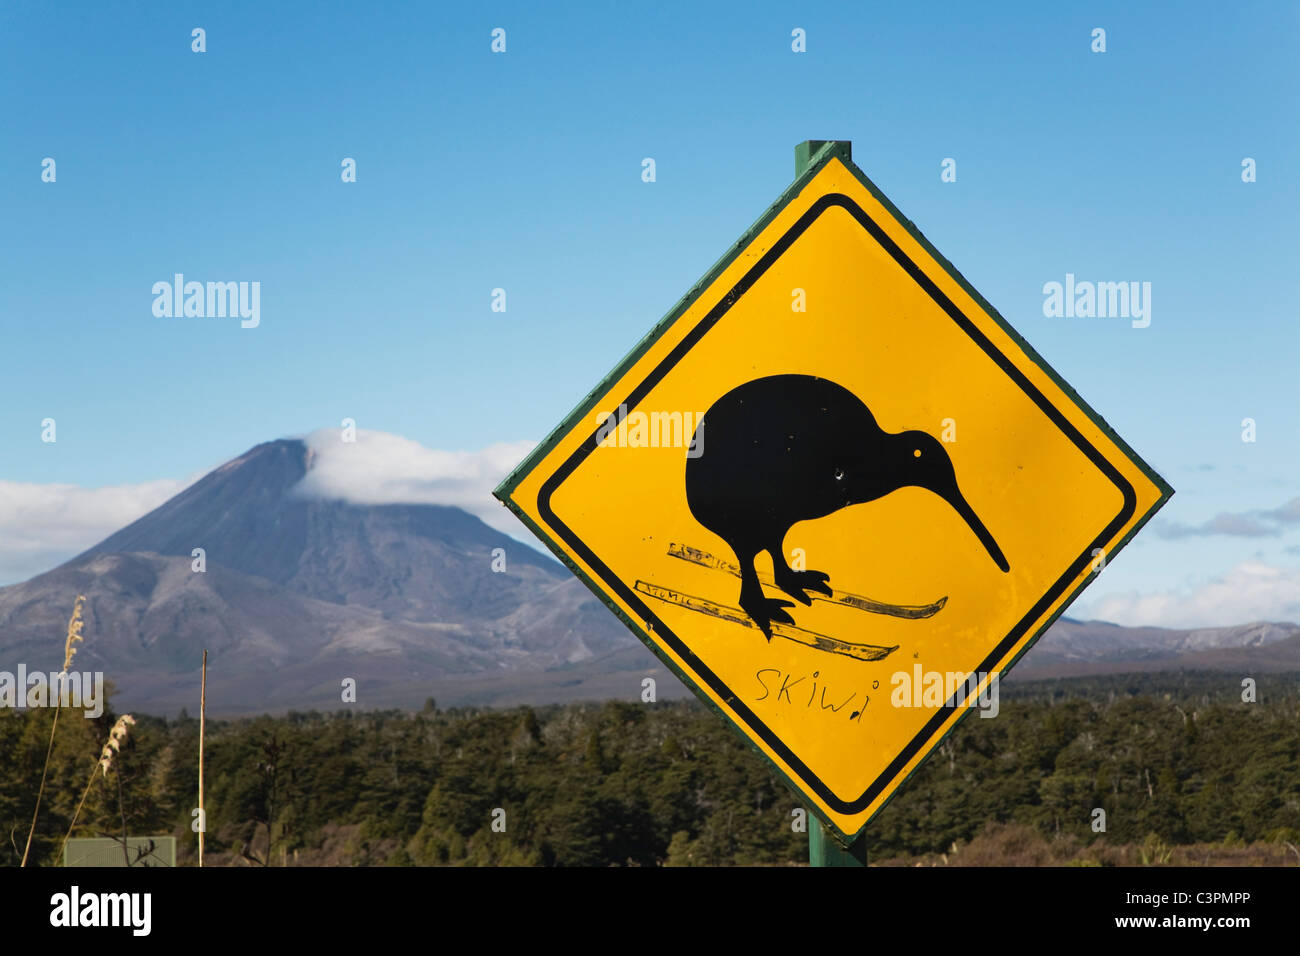 New Zealand, North Island, Animal crossing sign with mount ngauruhoe in background - Stock Image